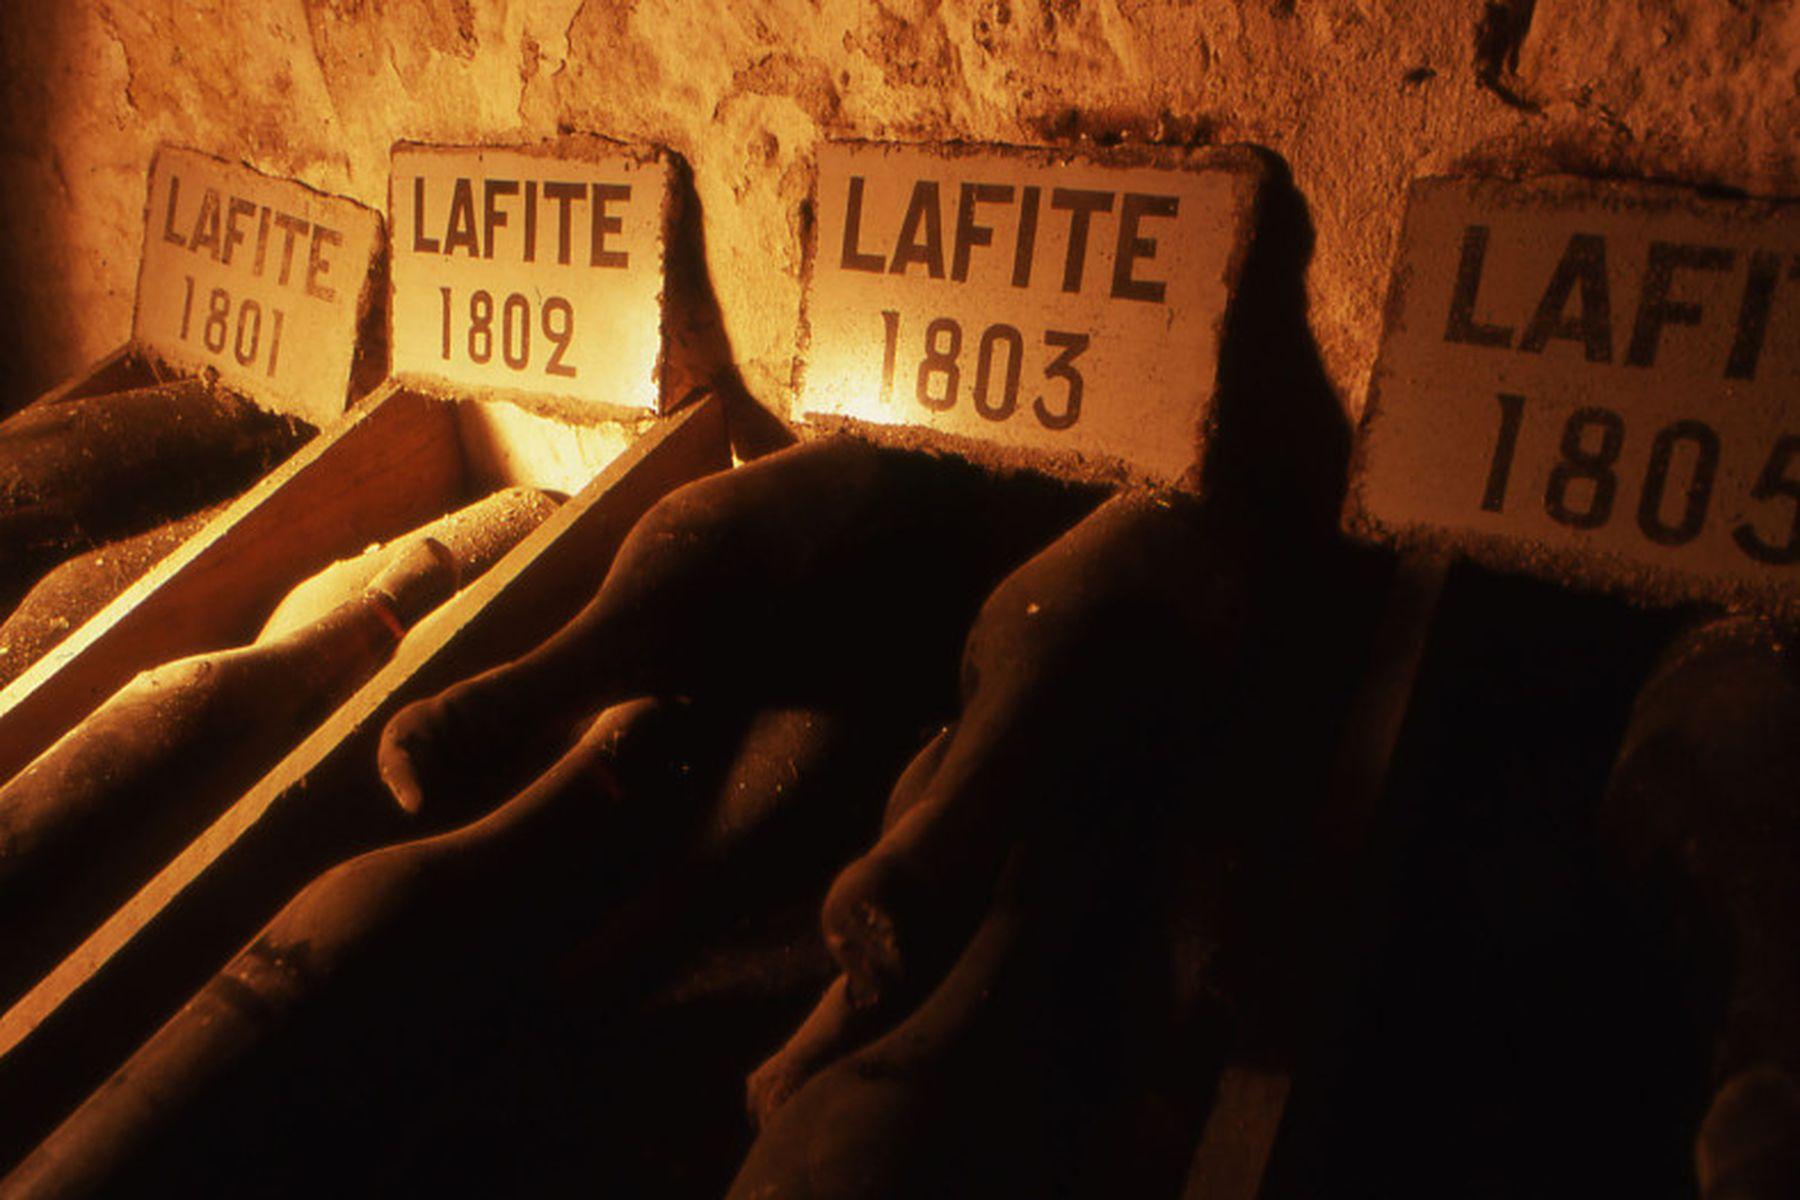 lafite-cru-exception-estimer-sa-cave-à-vin-location-caves-à-vin-privatives